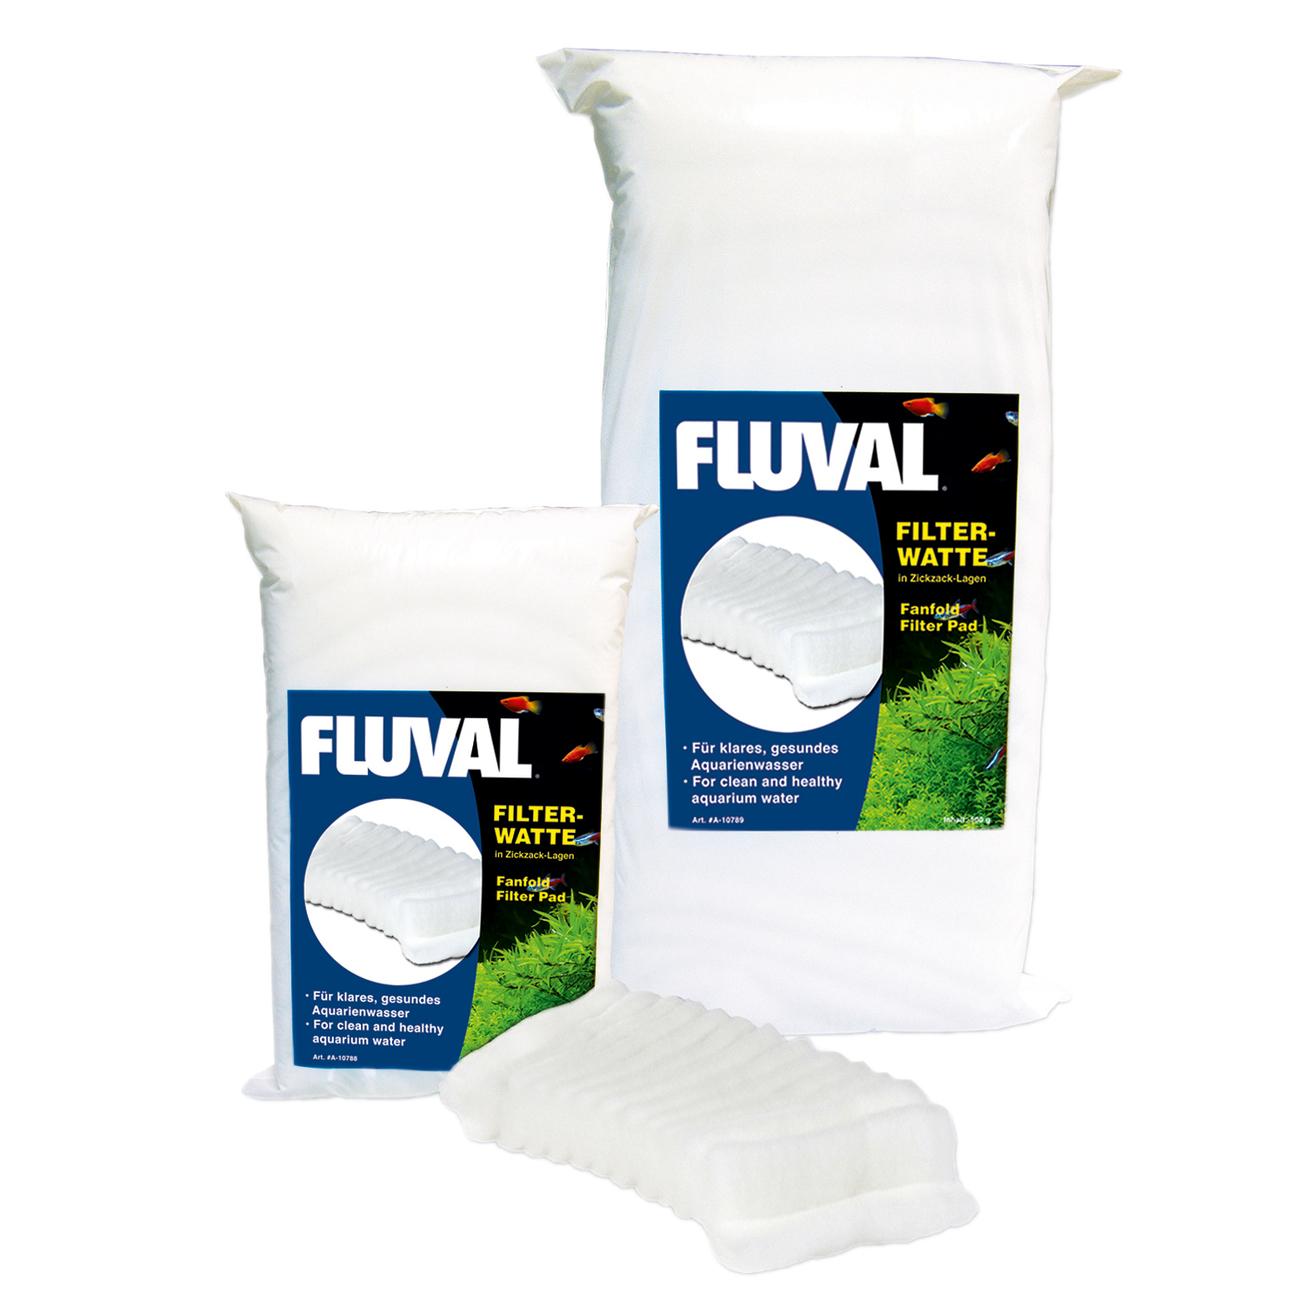 Fluval Filterwatte im Polybeutel